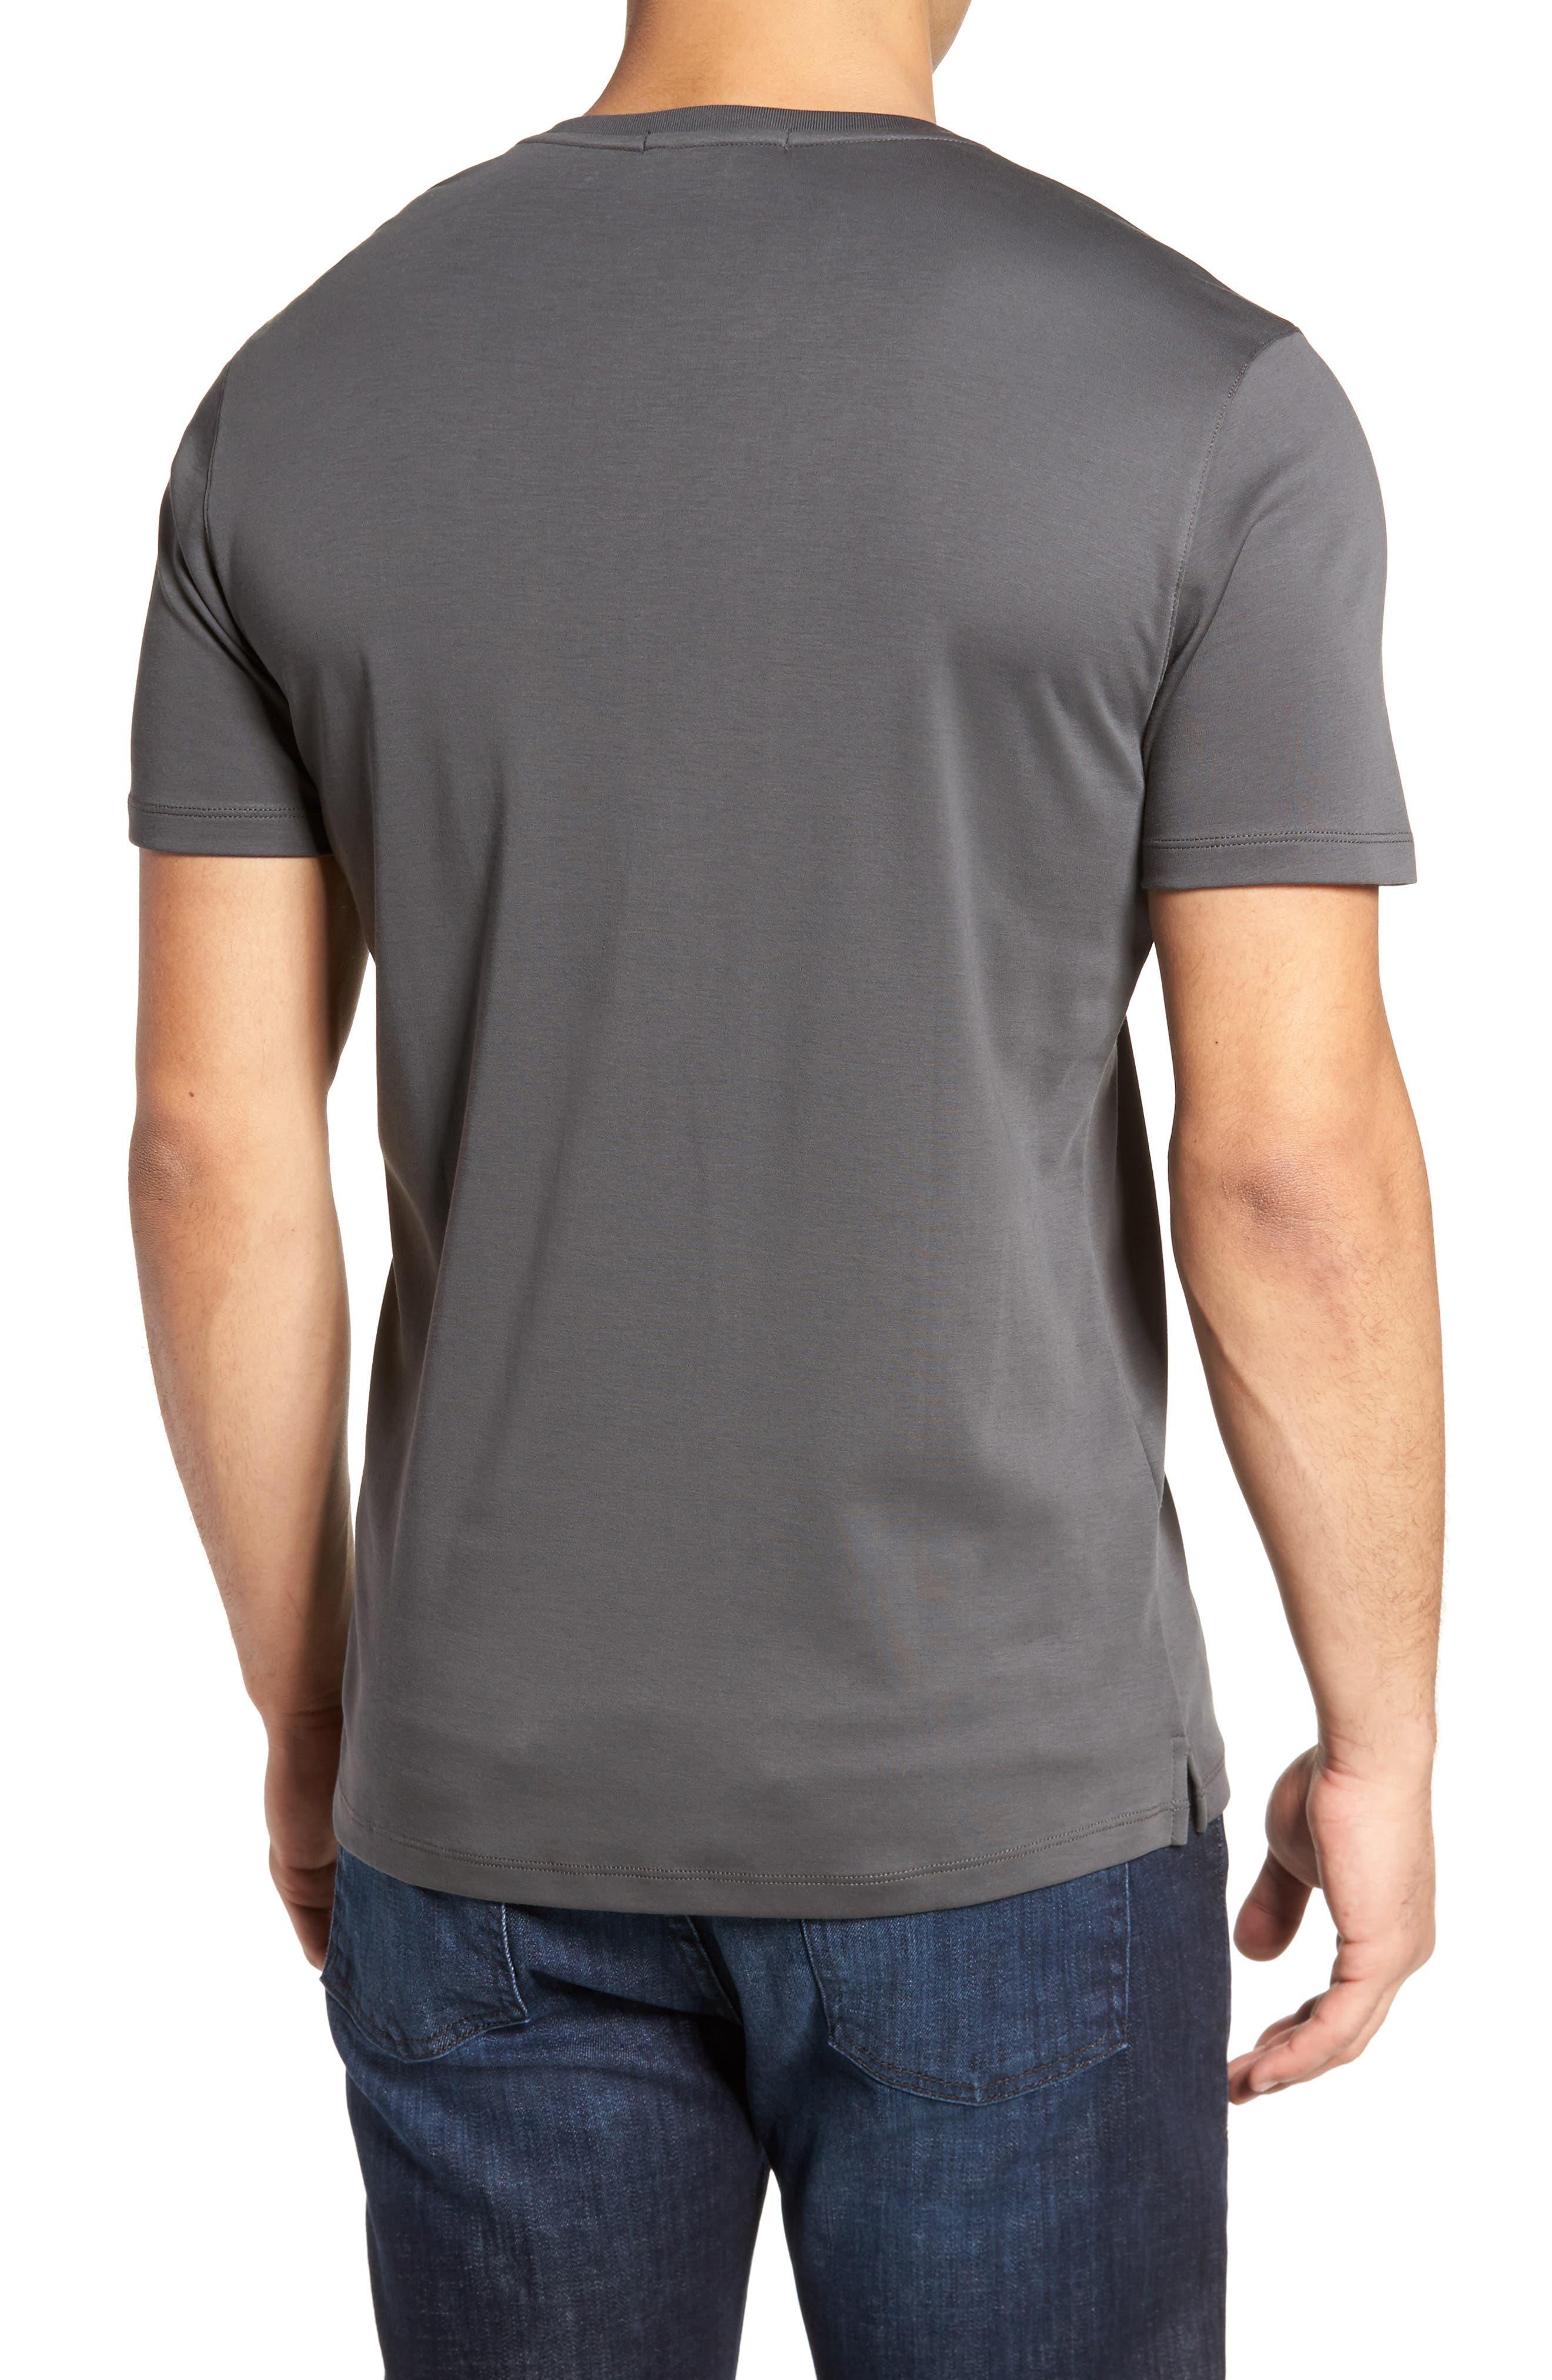 afa0808e57b Robert Barakett Clothing